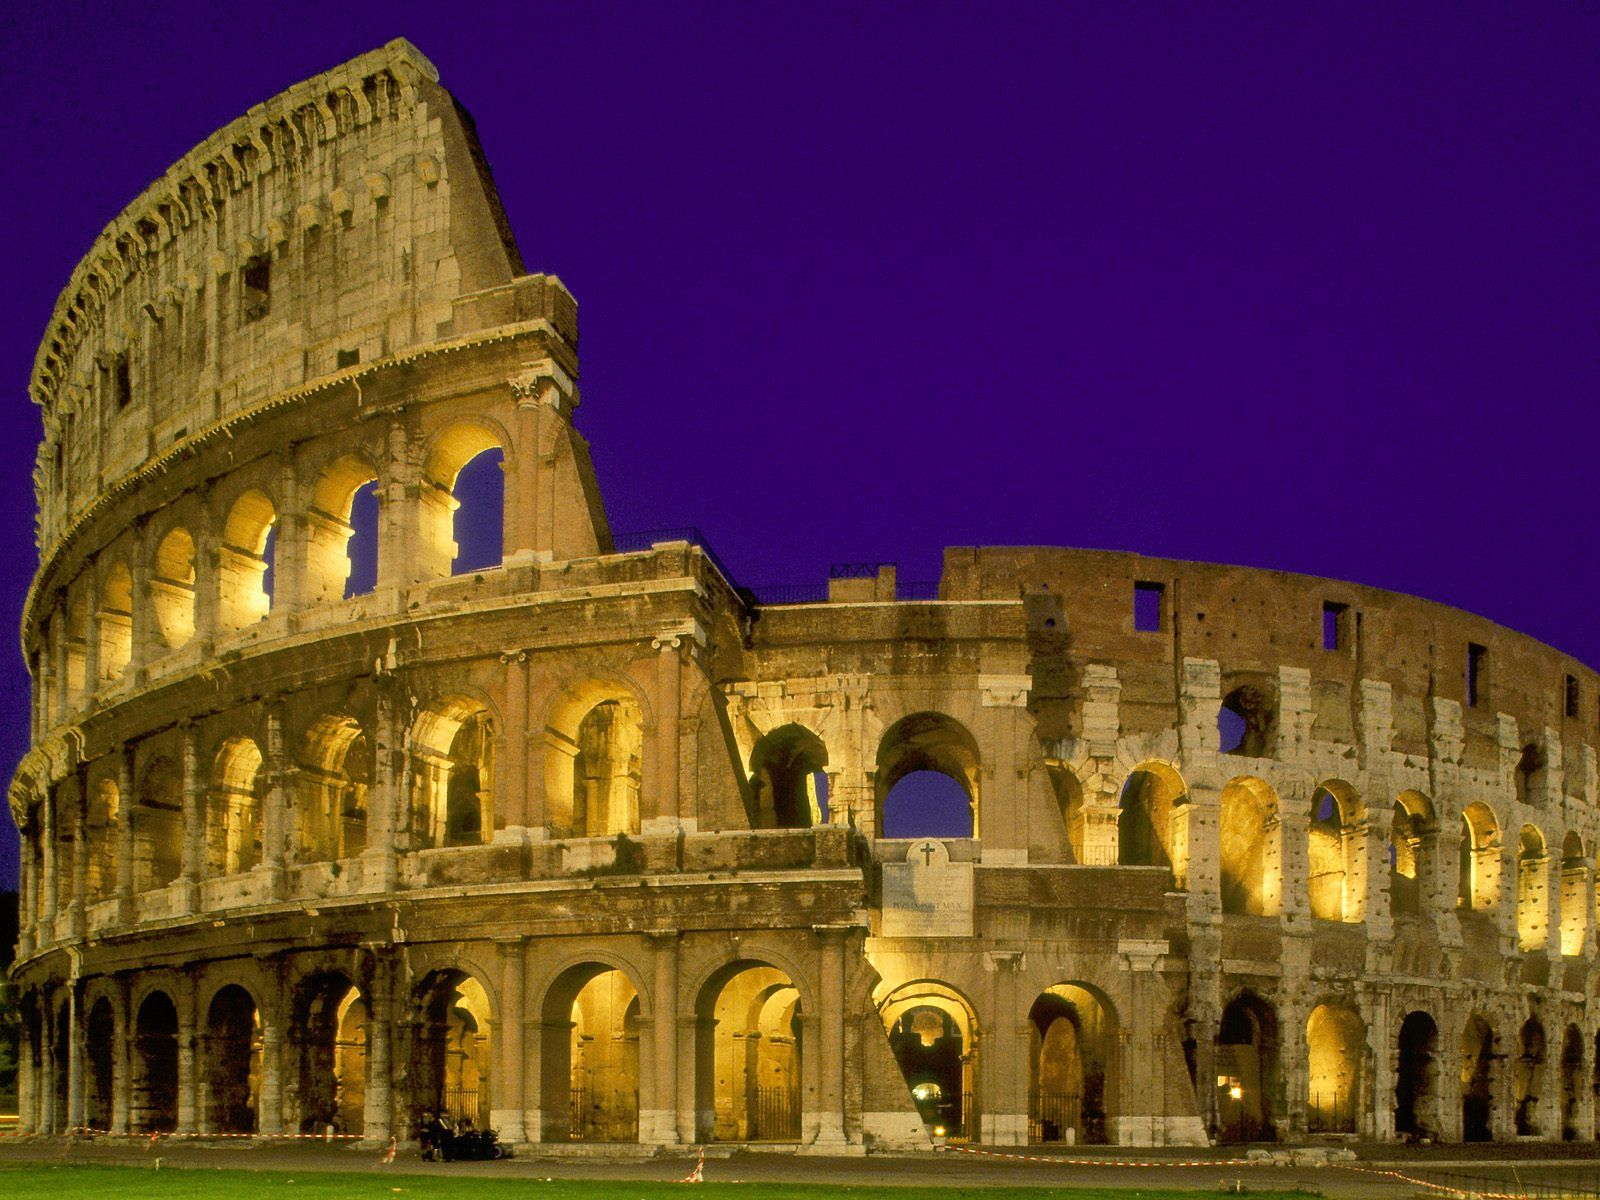 Estrcuturas Coliseo Romano Reseña Historica